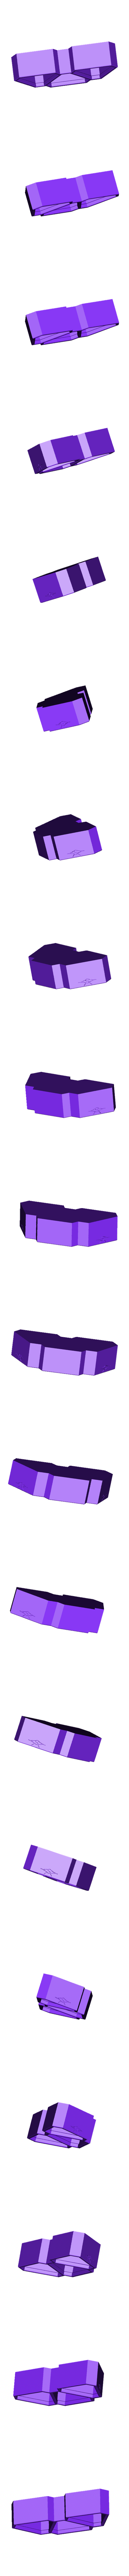 08.Breaching Pods mount.stl Download STL file Anubis • 3D print template, sergusy